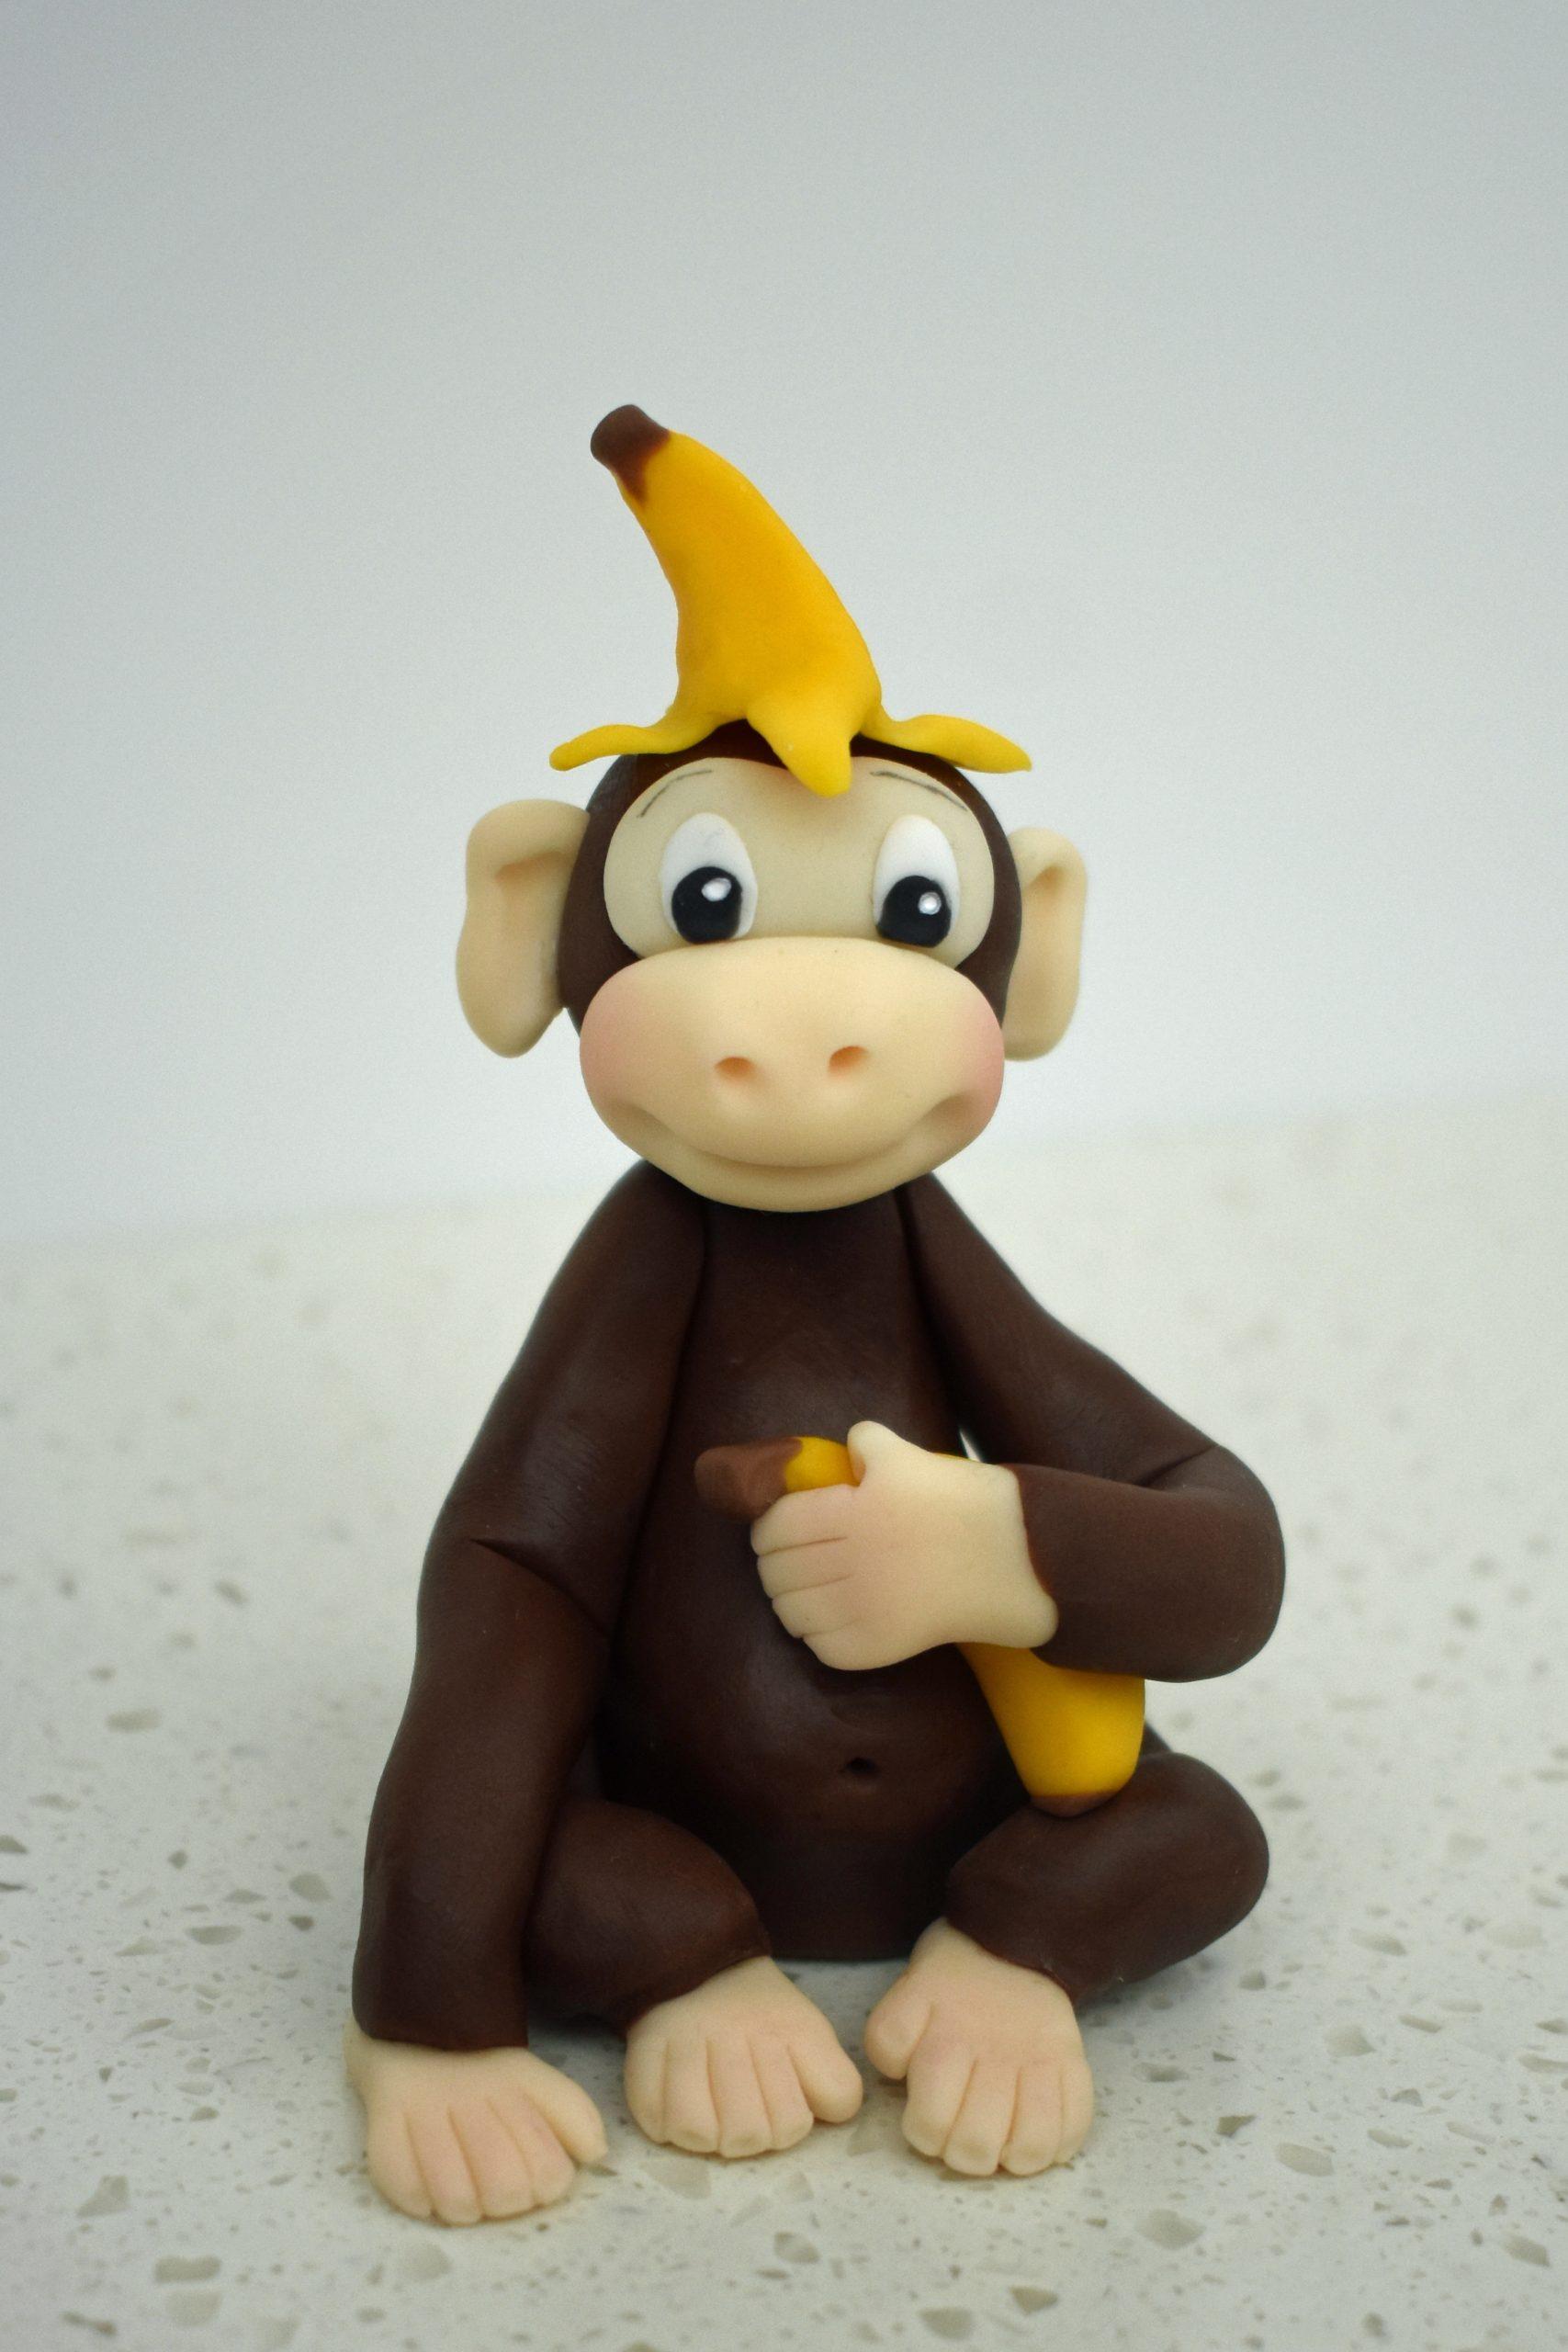 Bananas about monkey